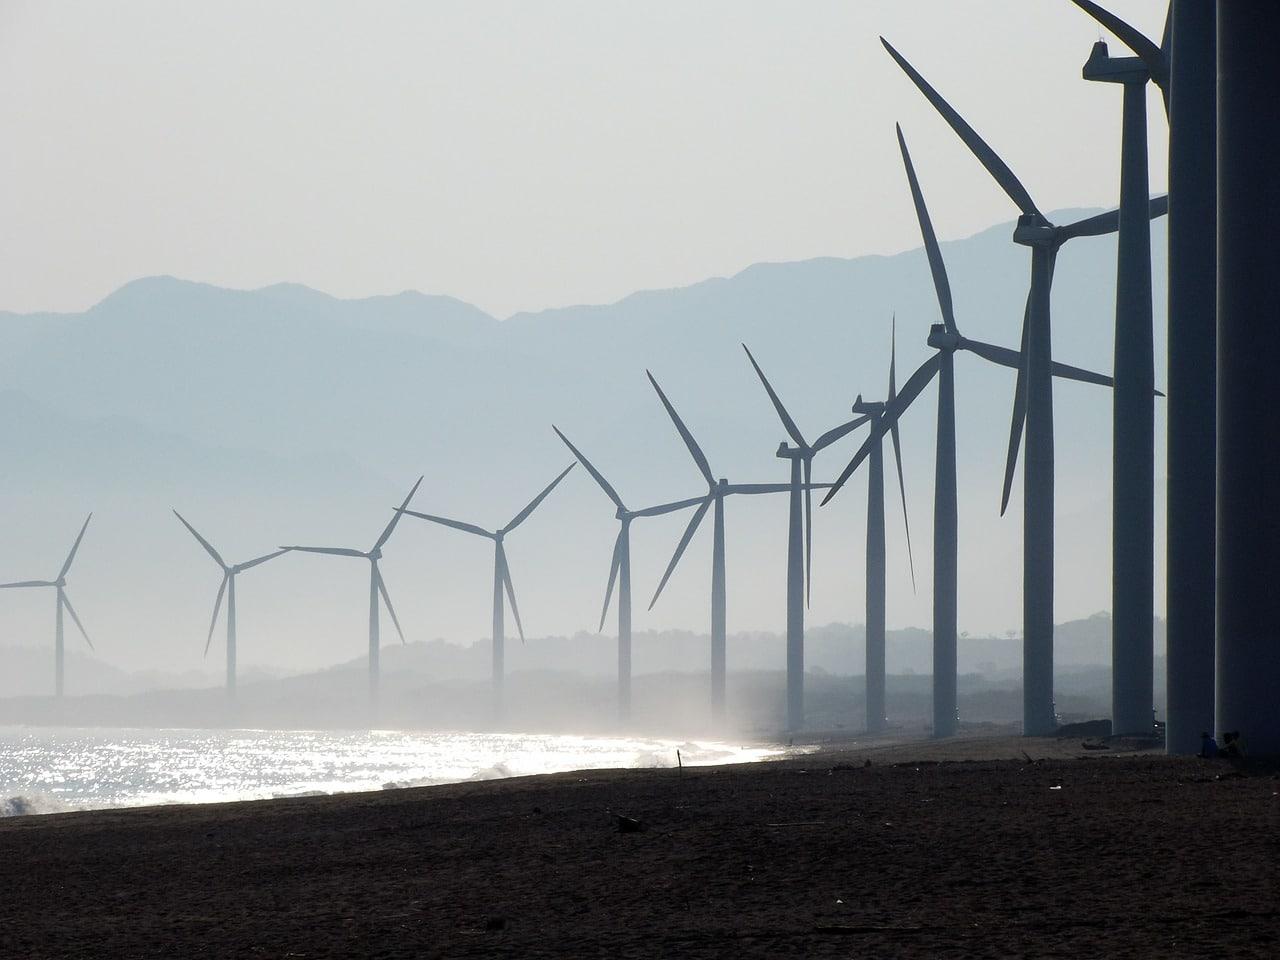 transición energías renovables